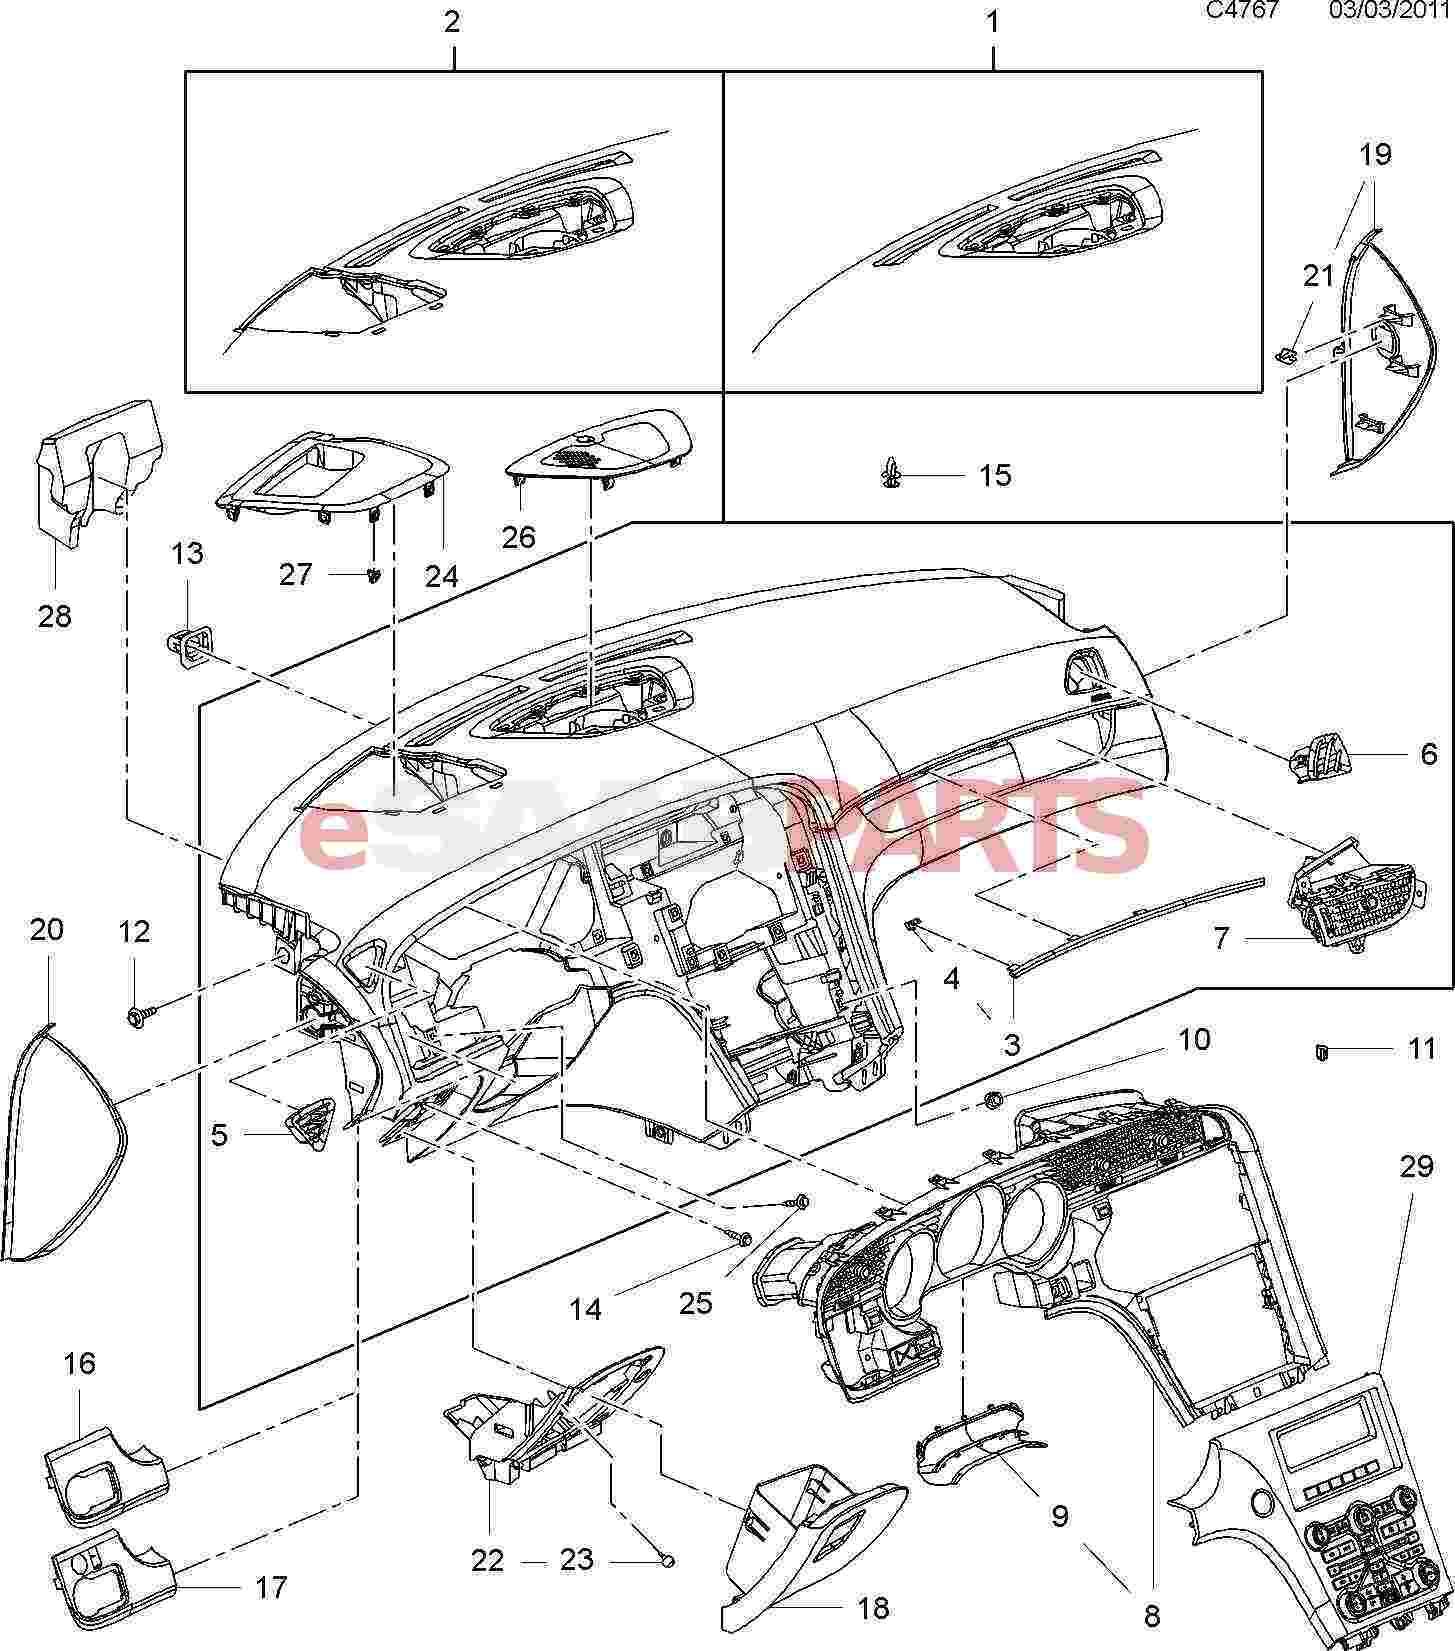 Car Dashboard Diagram Esaabparts Saab 9 5 650 Car Body Internal Parts